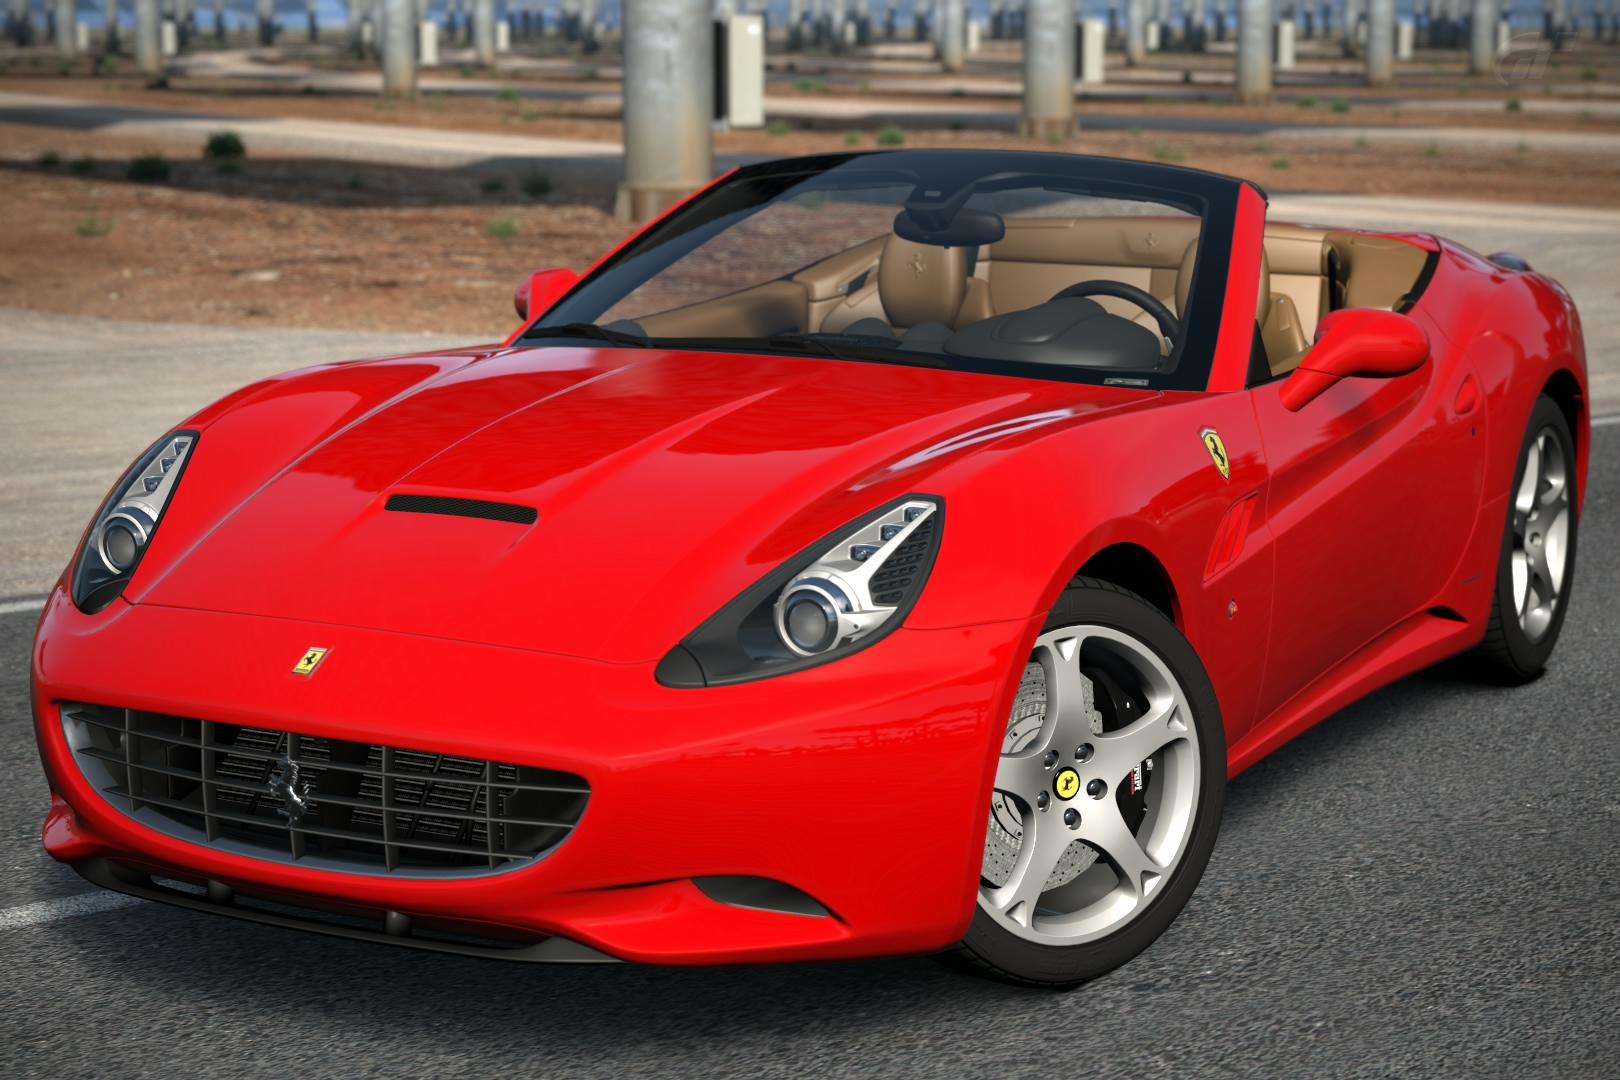 Ferrari California 08 Gran Turismo Wiki Fandom Powered By Wikia